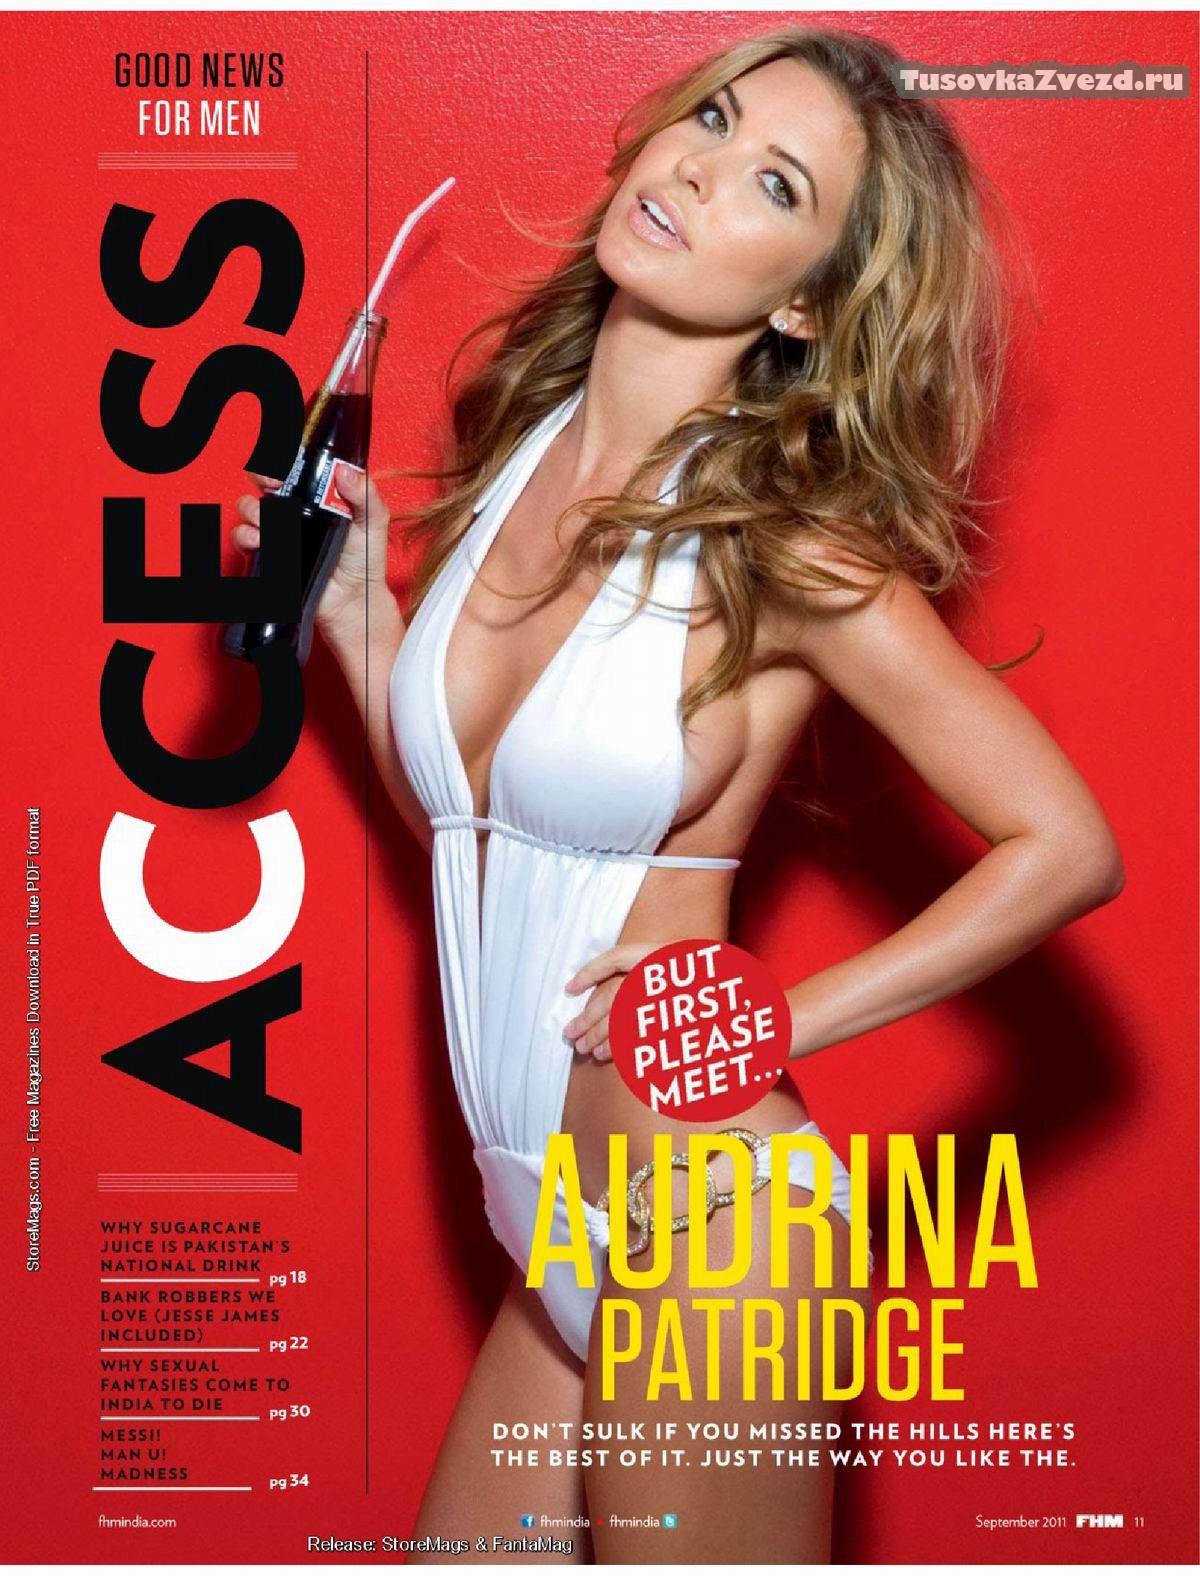 Одрина Пэтридж (Audrina Patridge) фото в журнале FHM Индия, сентябрь 2011